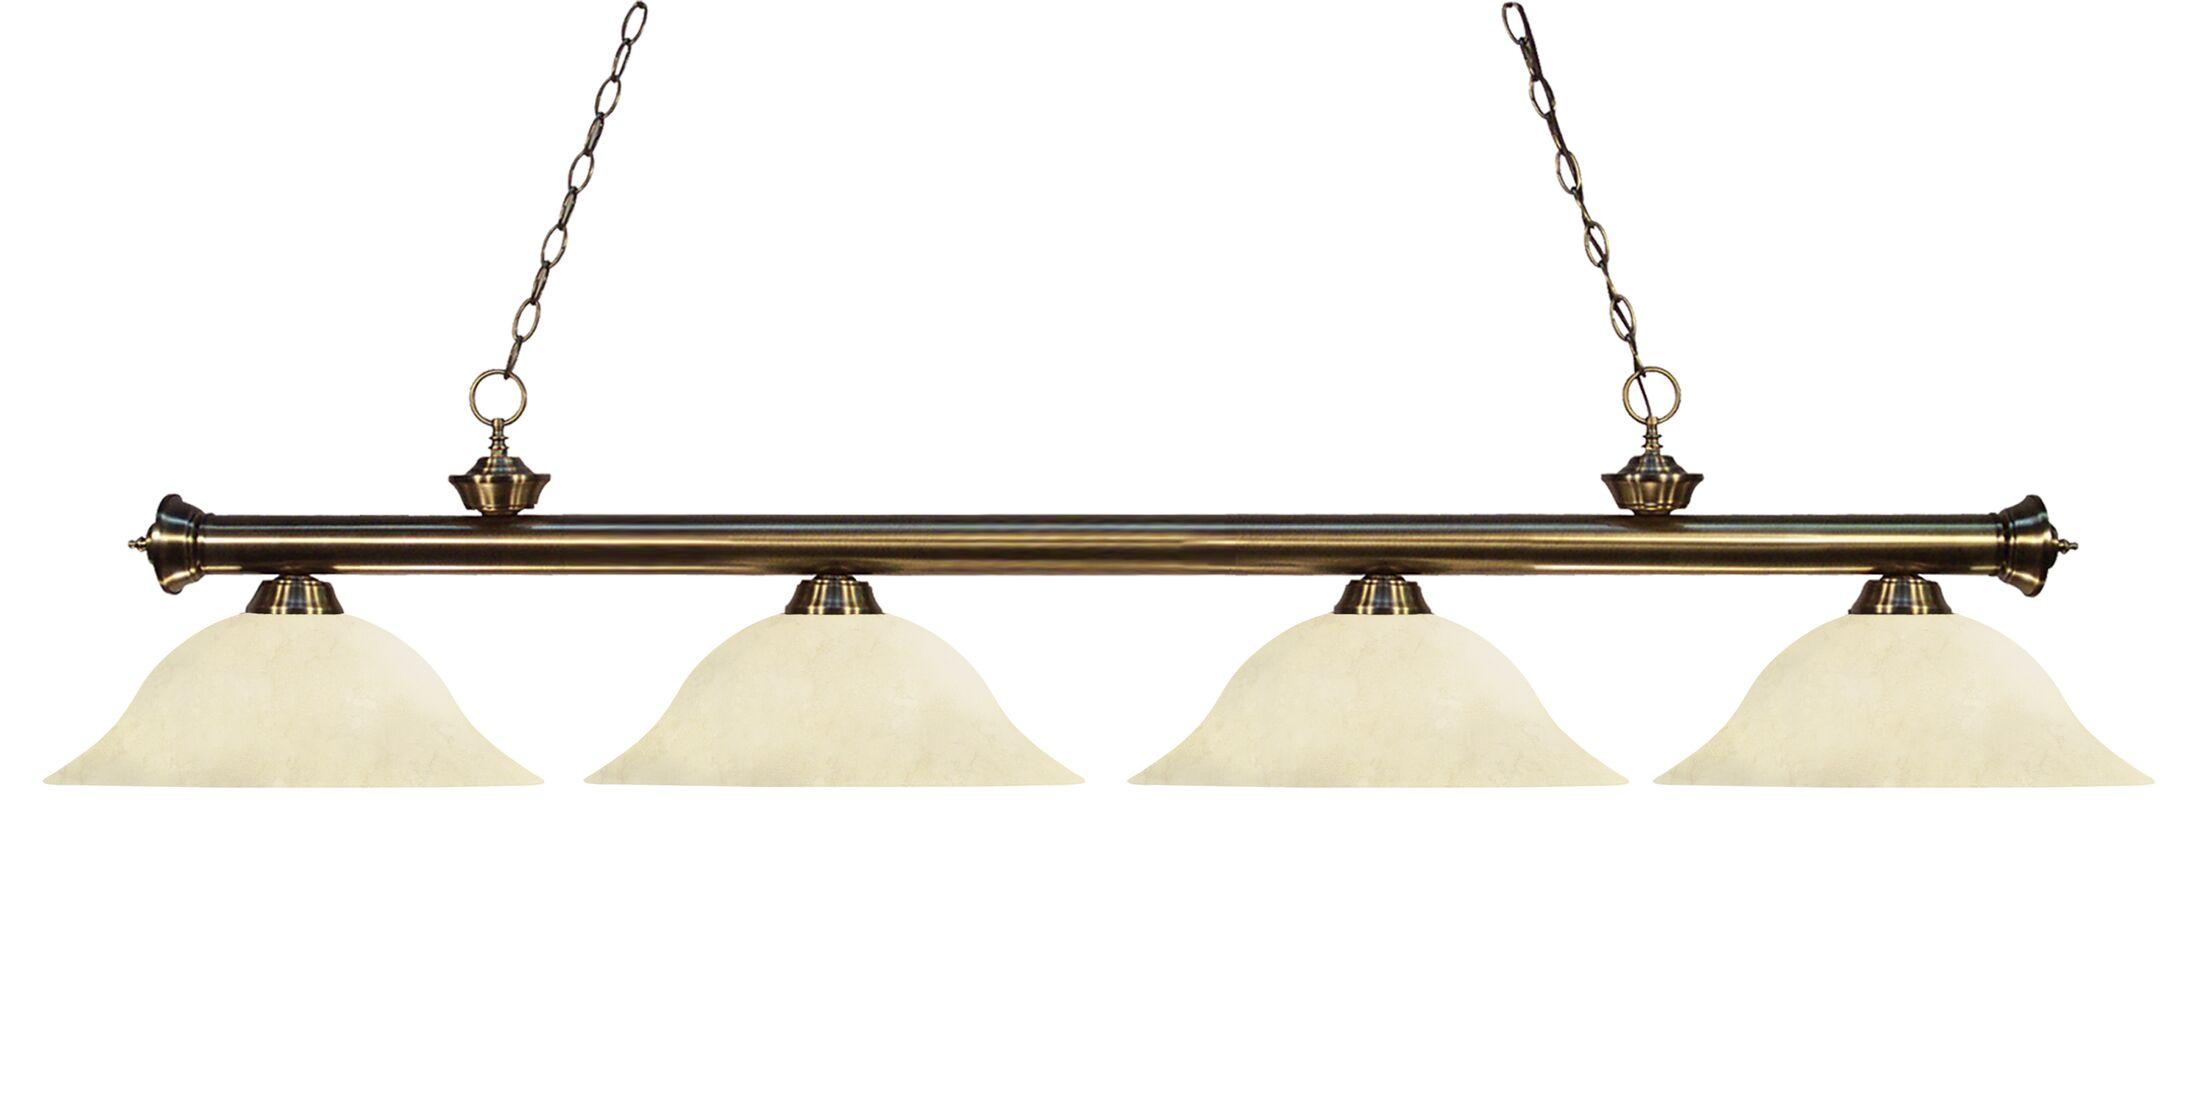 Zephyr 4-Light Incandescent Billiard Light with Hanging Chain